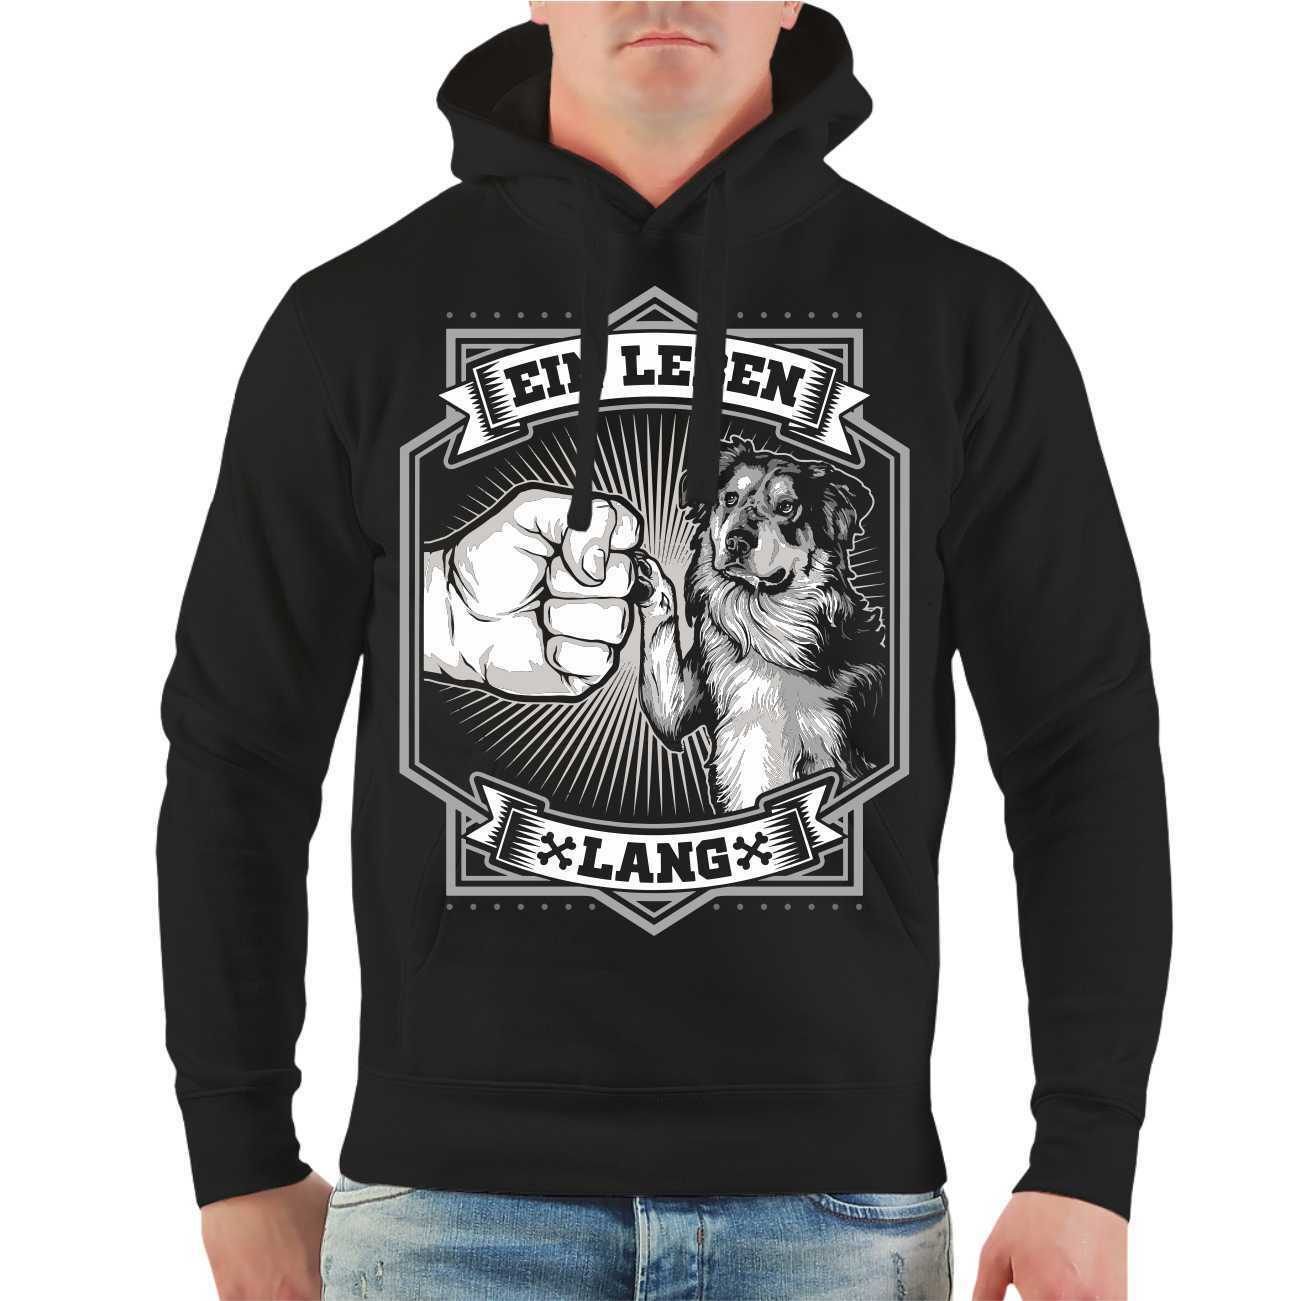 Kapuzenpullover Sweatshirt Hoodie Australian Shepherd Schwarz Größe S - 8XL